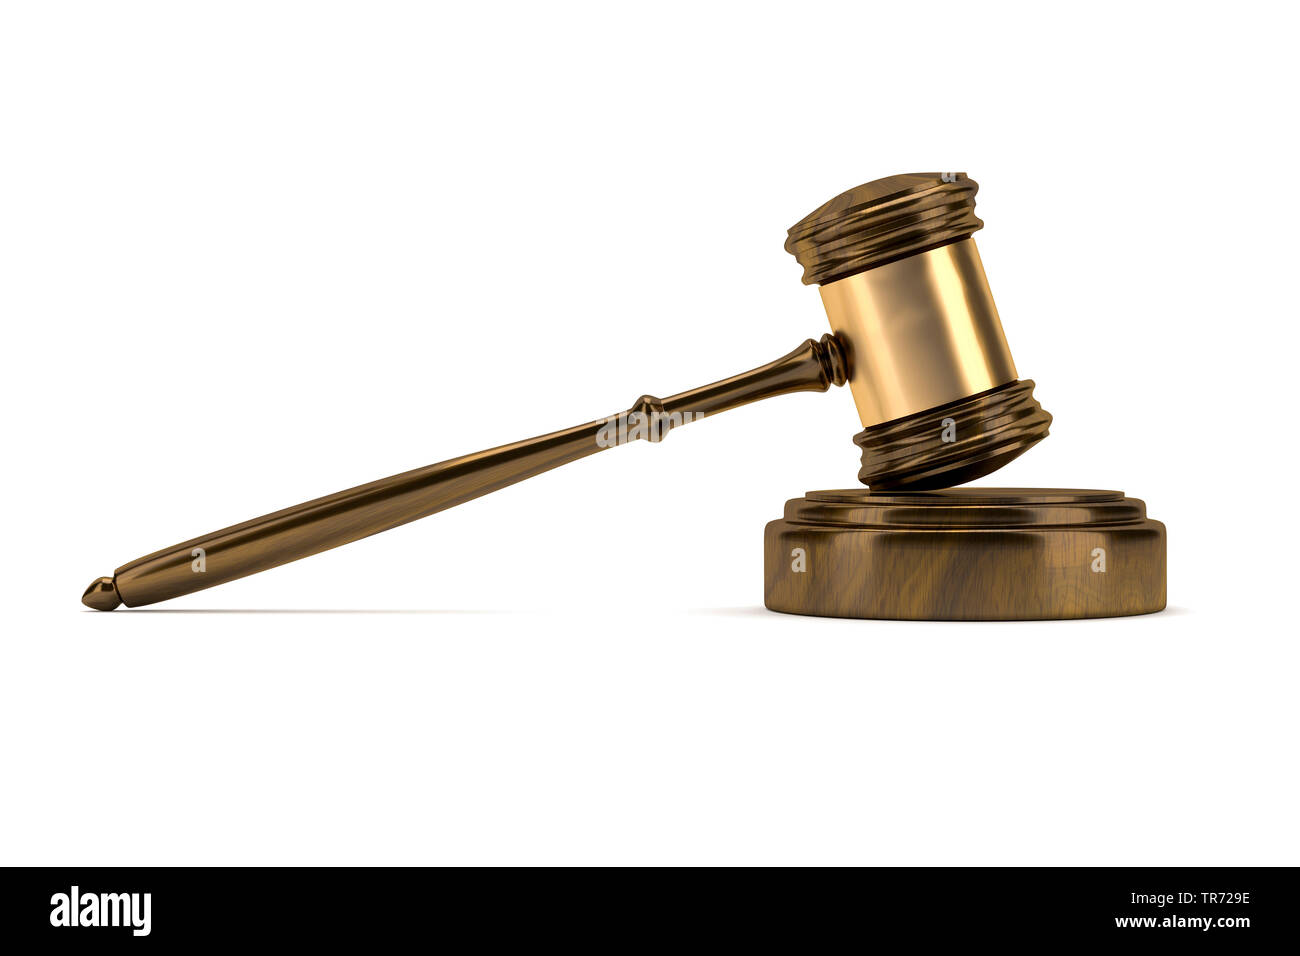 3D-Computergrafik, Justizhammer aus Holz vor weissem Hintergrund | 3D computer graphic, ustice hammer out of wood against white background | BLWS49542 - Stock Image